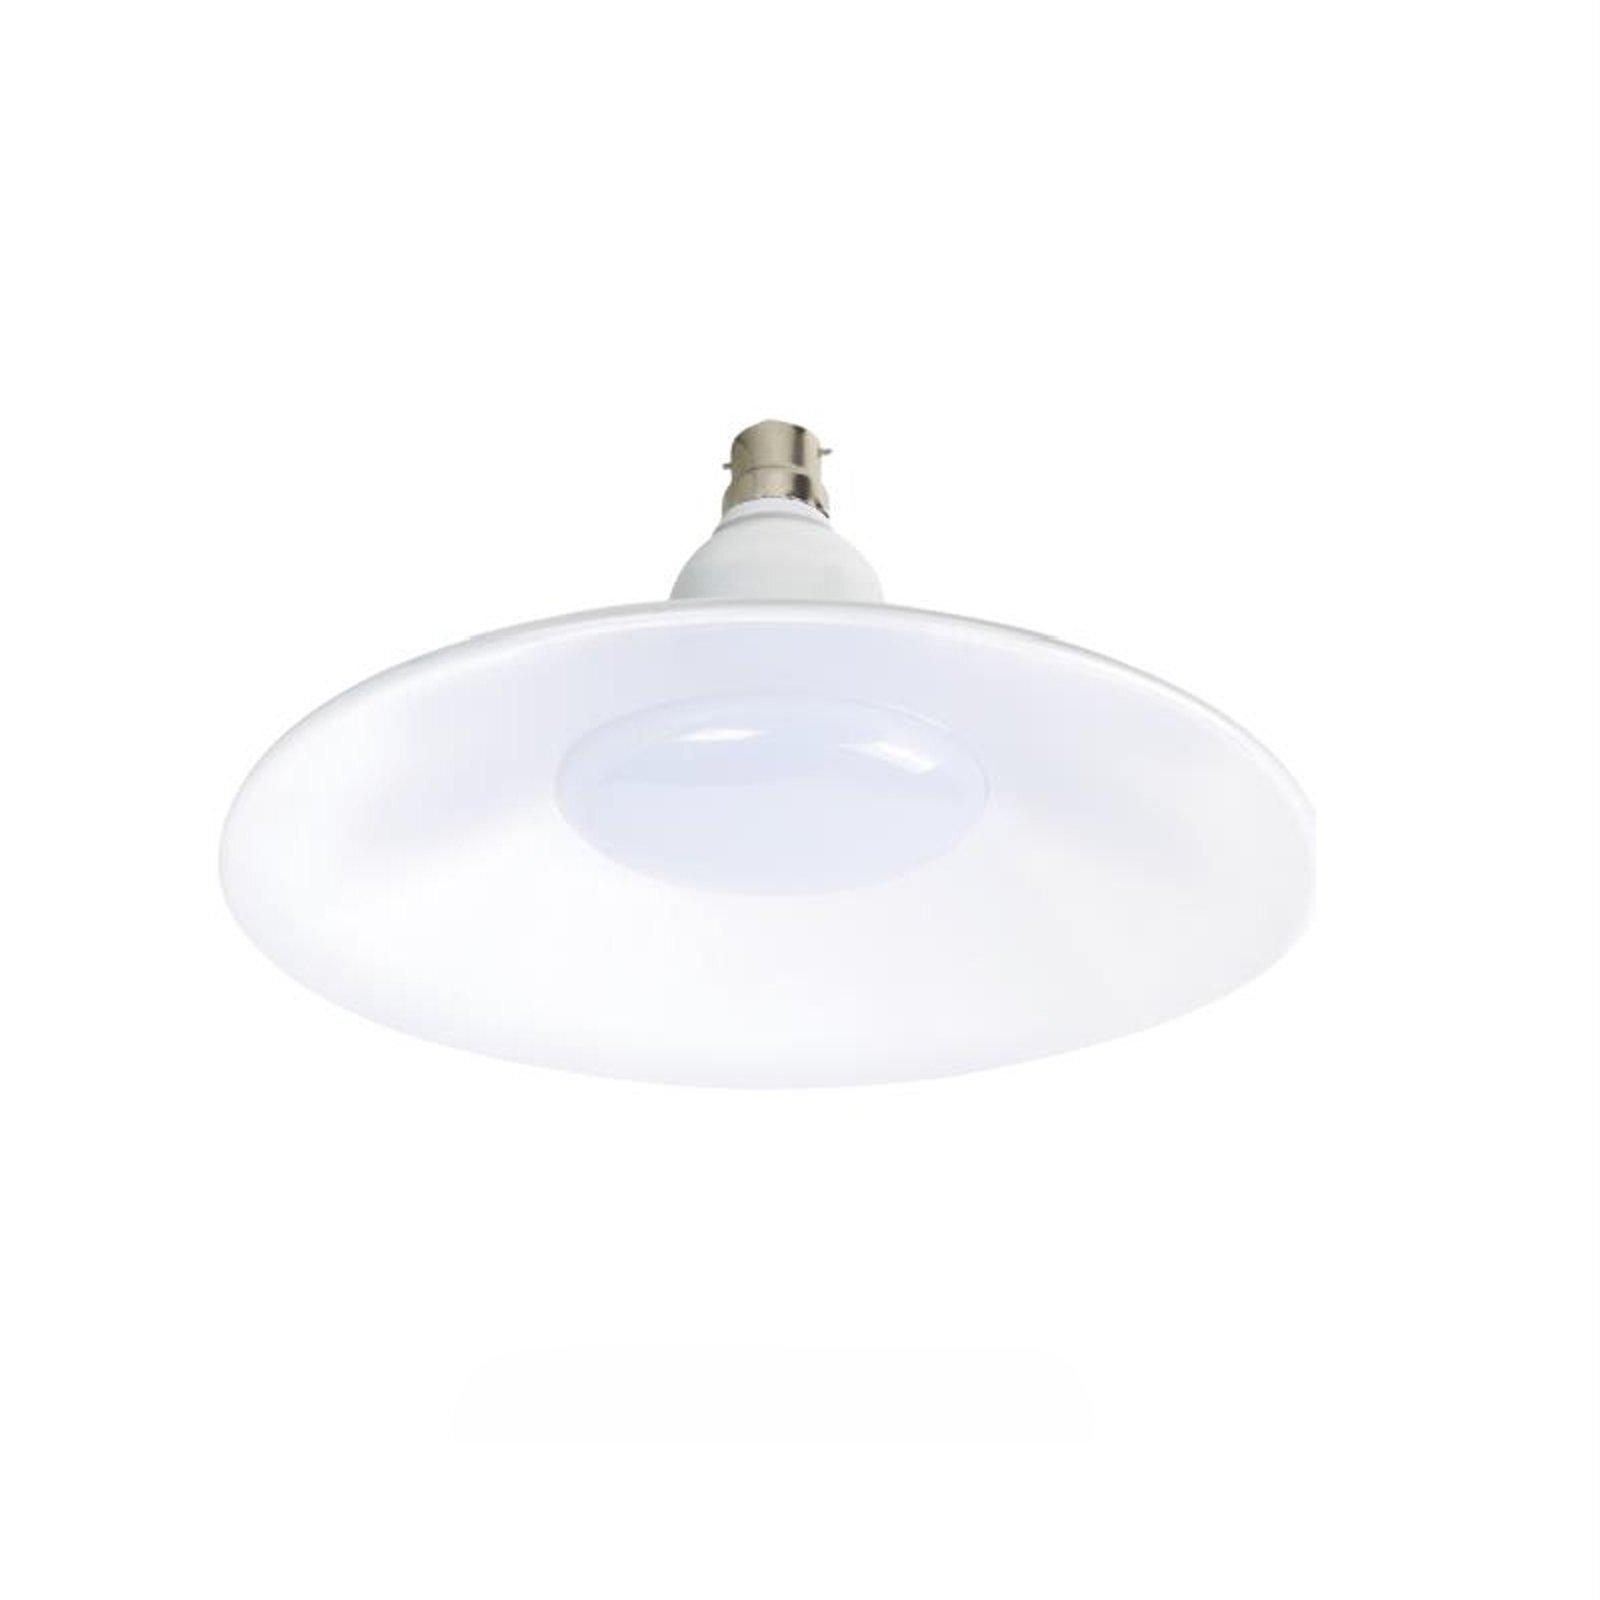 HPM LED Light Globe With Shade